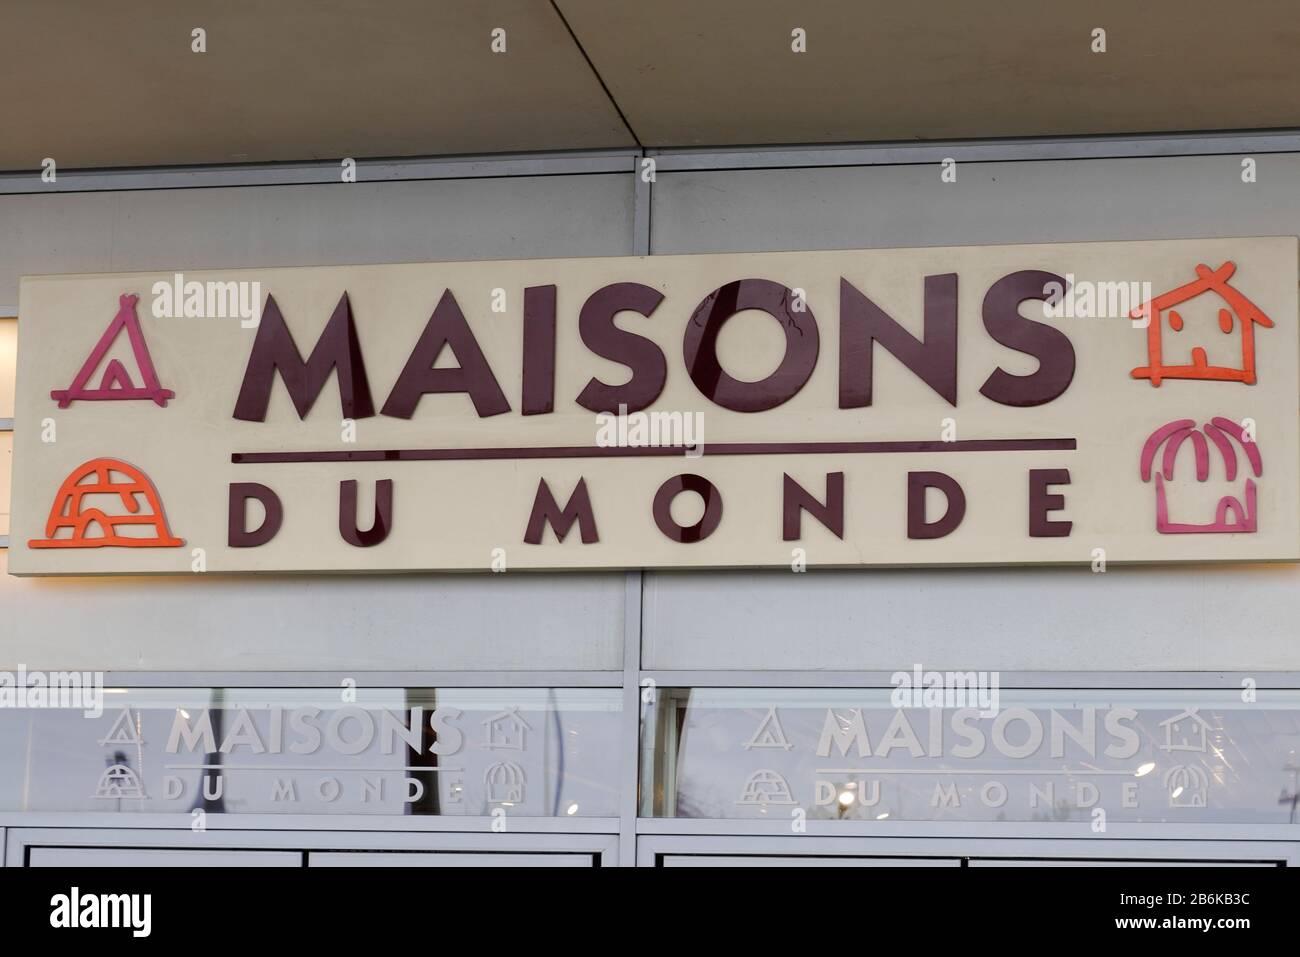 Bordeaux Aquitaine France 01 15 2020 Maisons Du Monde Logo Sign On Store Furniture Shop French Decoration Chain Stock Photo Alamy